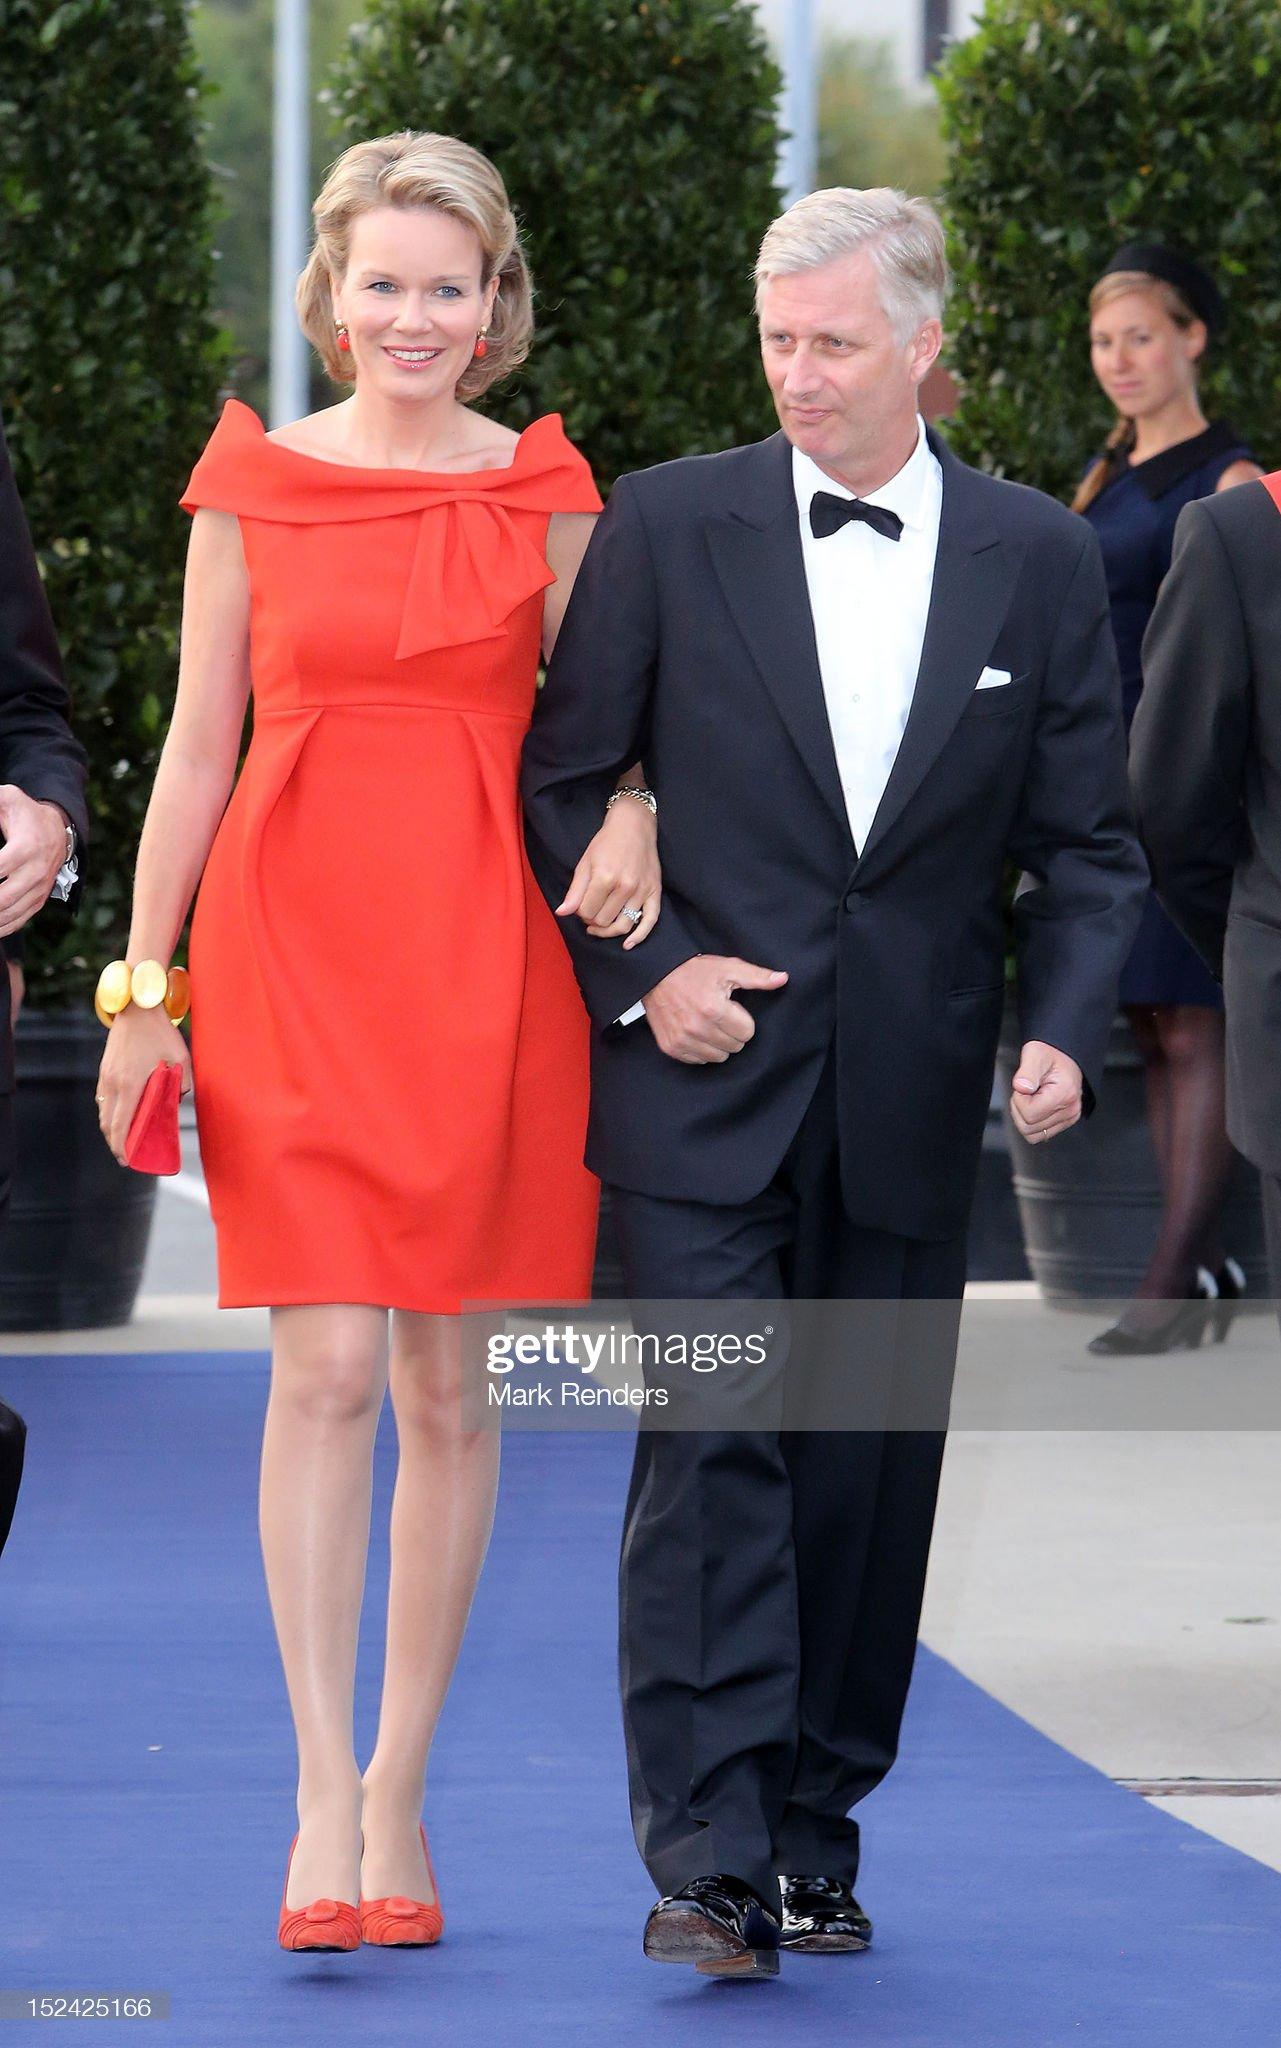 Вечерние наряды Королевы Матильды Prince Philippe And Princess Mathilde Of Belgium Attend Gala For King Baudouin Foundation : News Photo